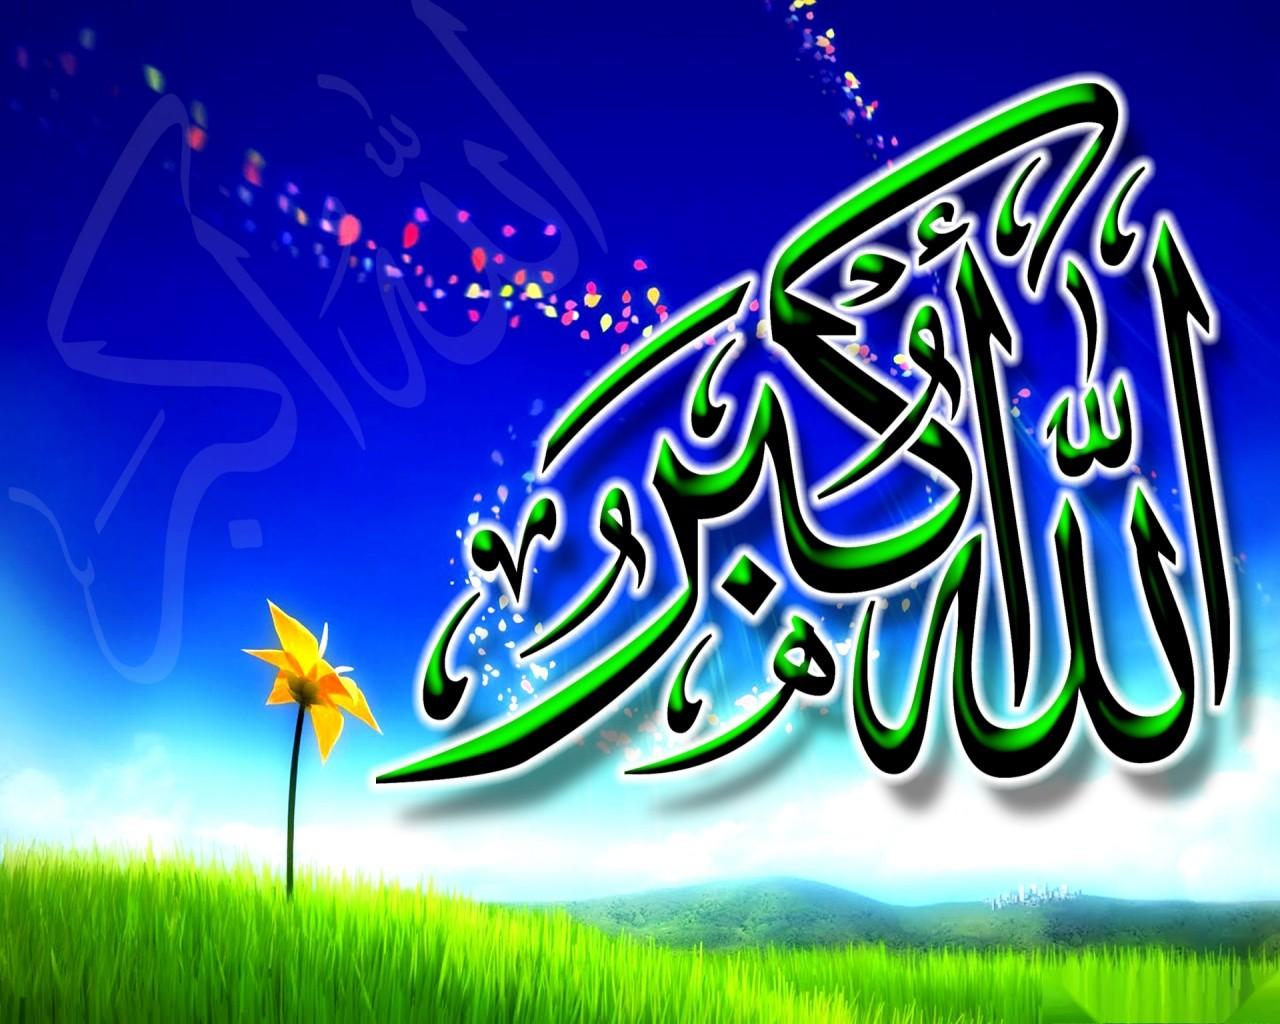 Wallpaper Allah Wallpapers New